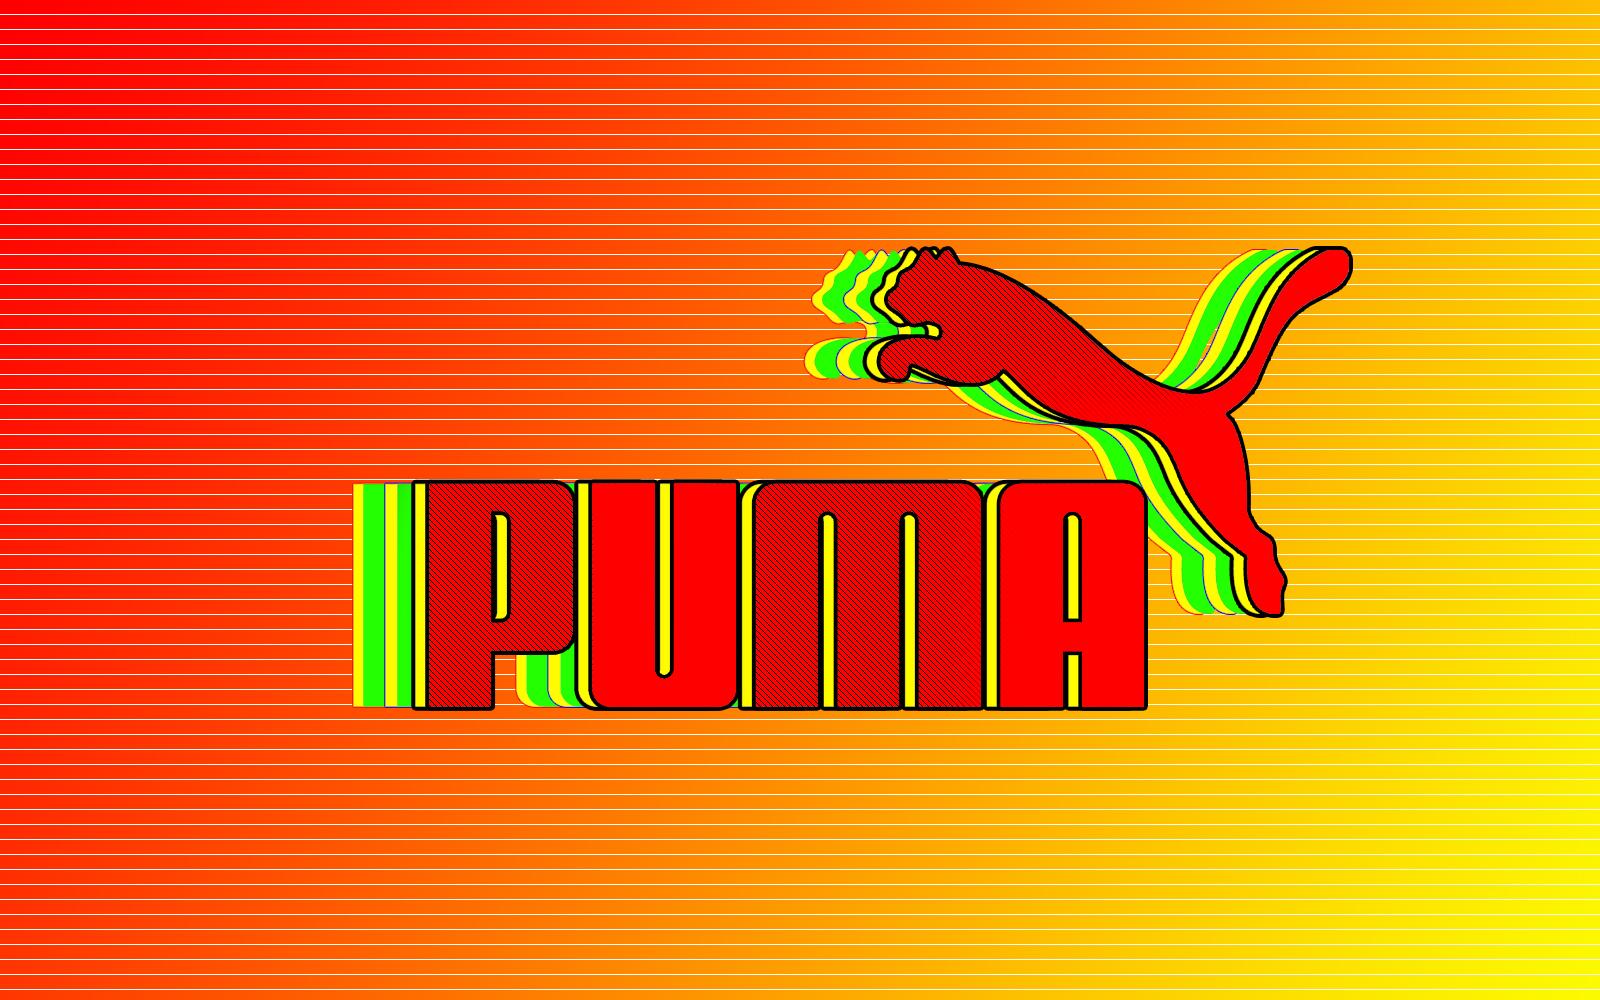 puma logo by wytzelangen designs interfaces logos logotypes 2008 2015 1600x1000